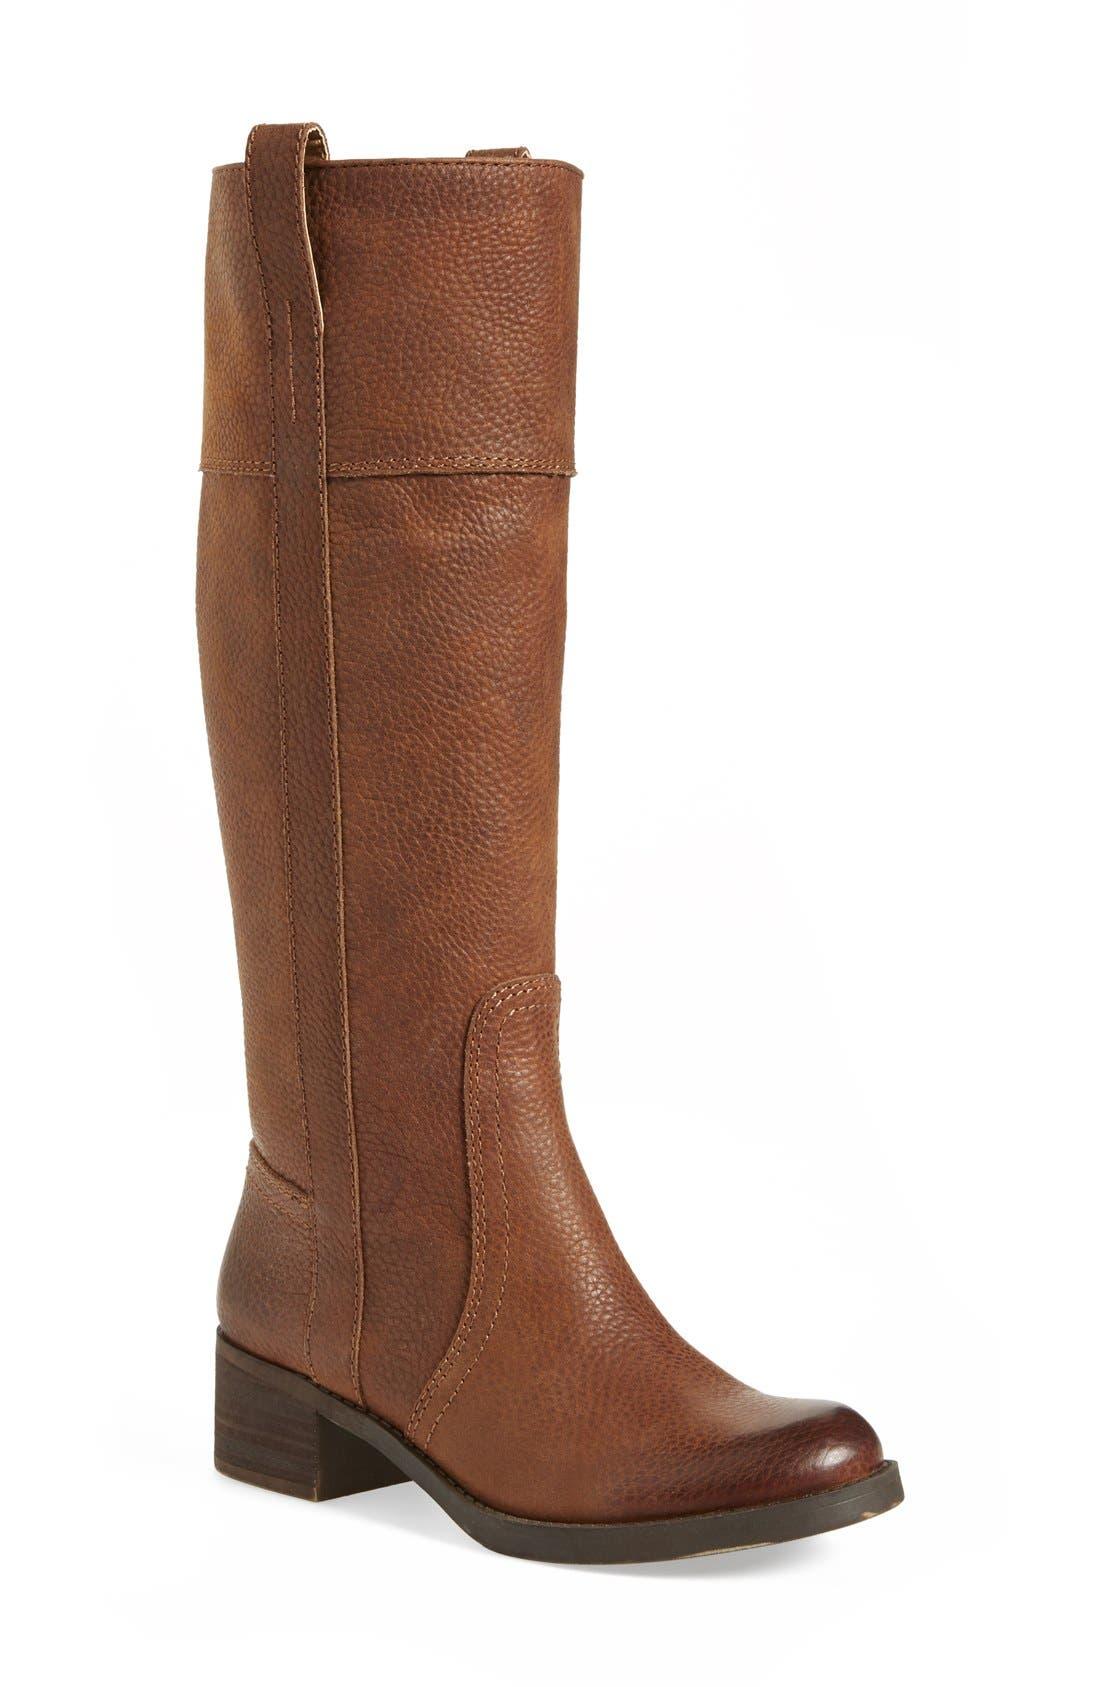 Alternate Image 1 Selected - Lucky Brand 'Heloisse' Boot (Women)